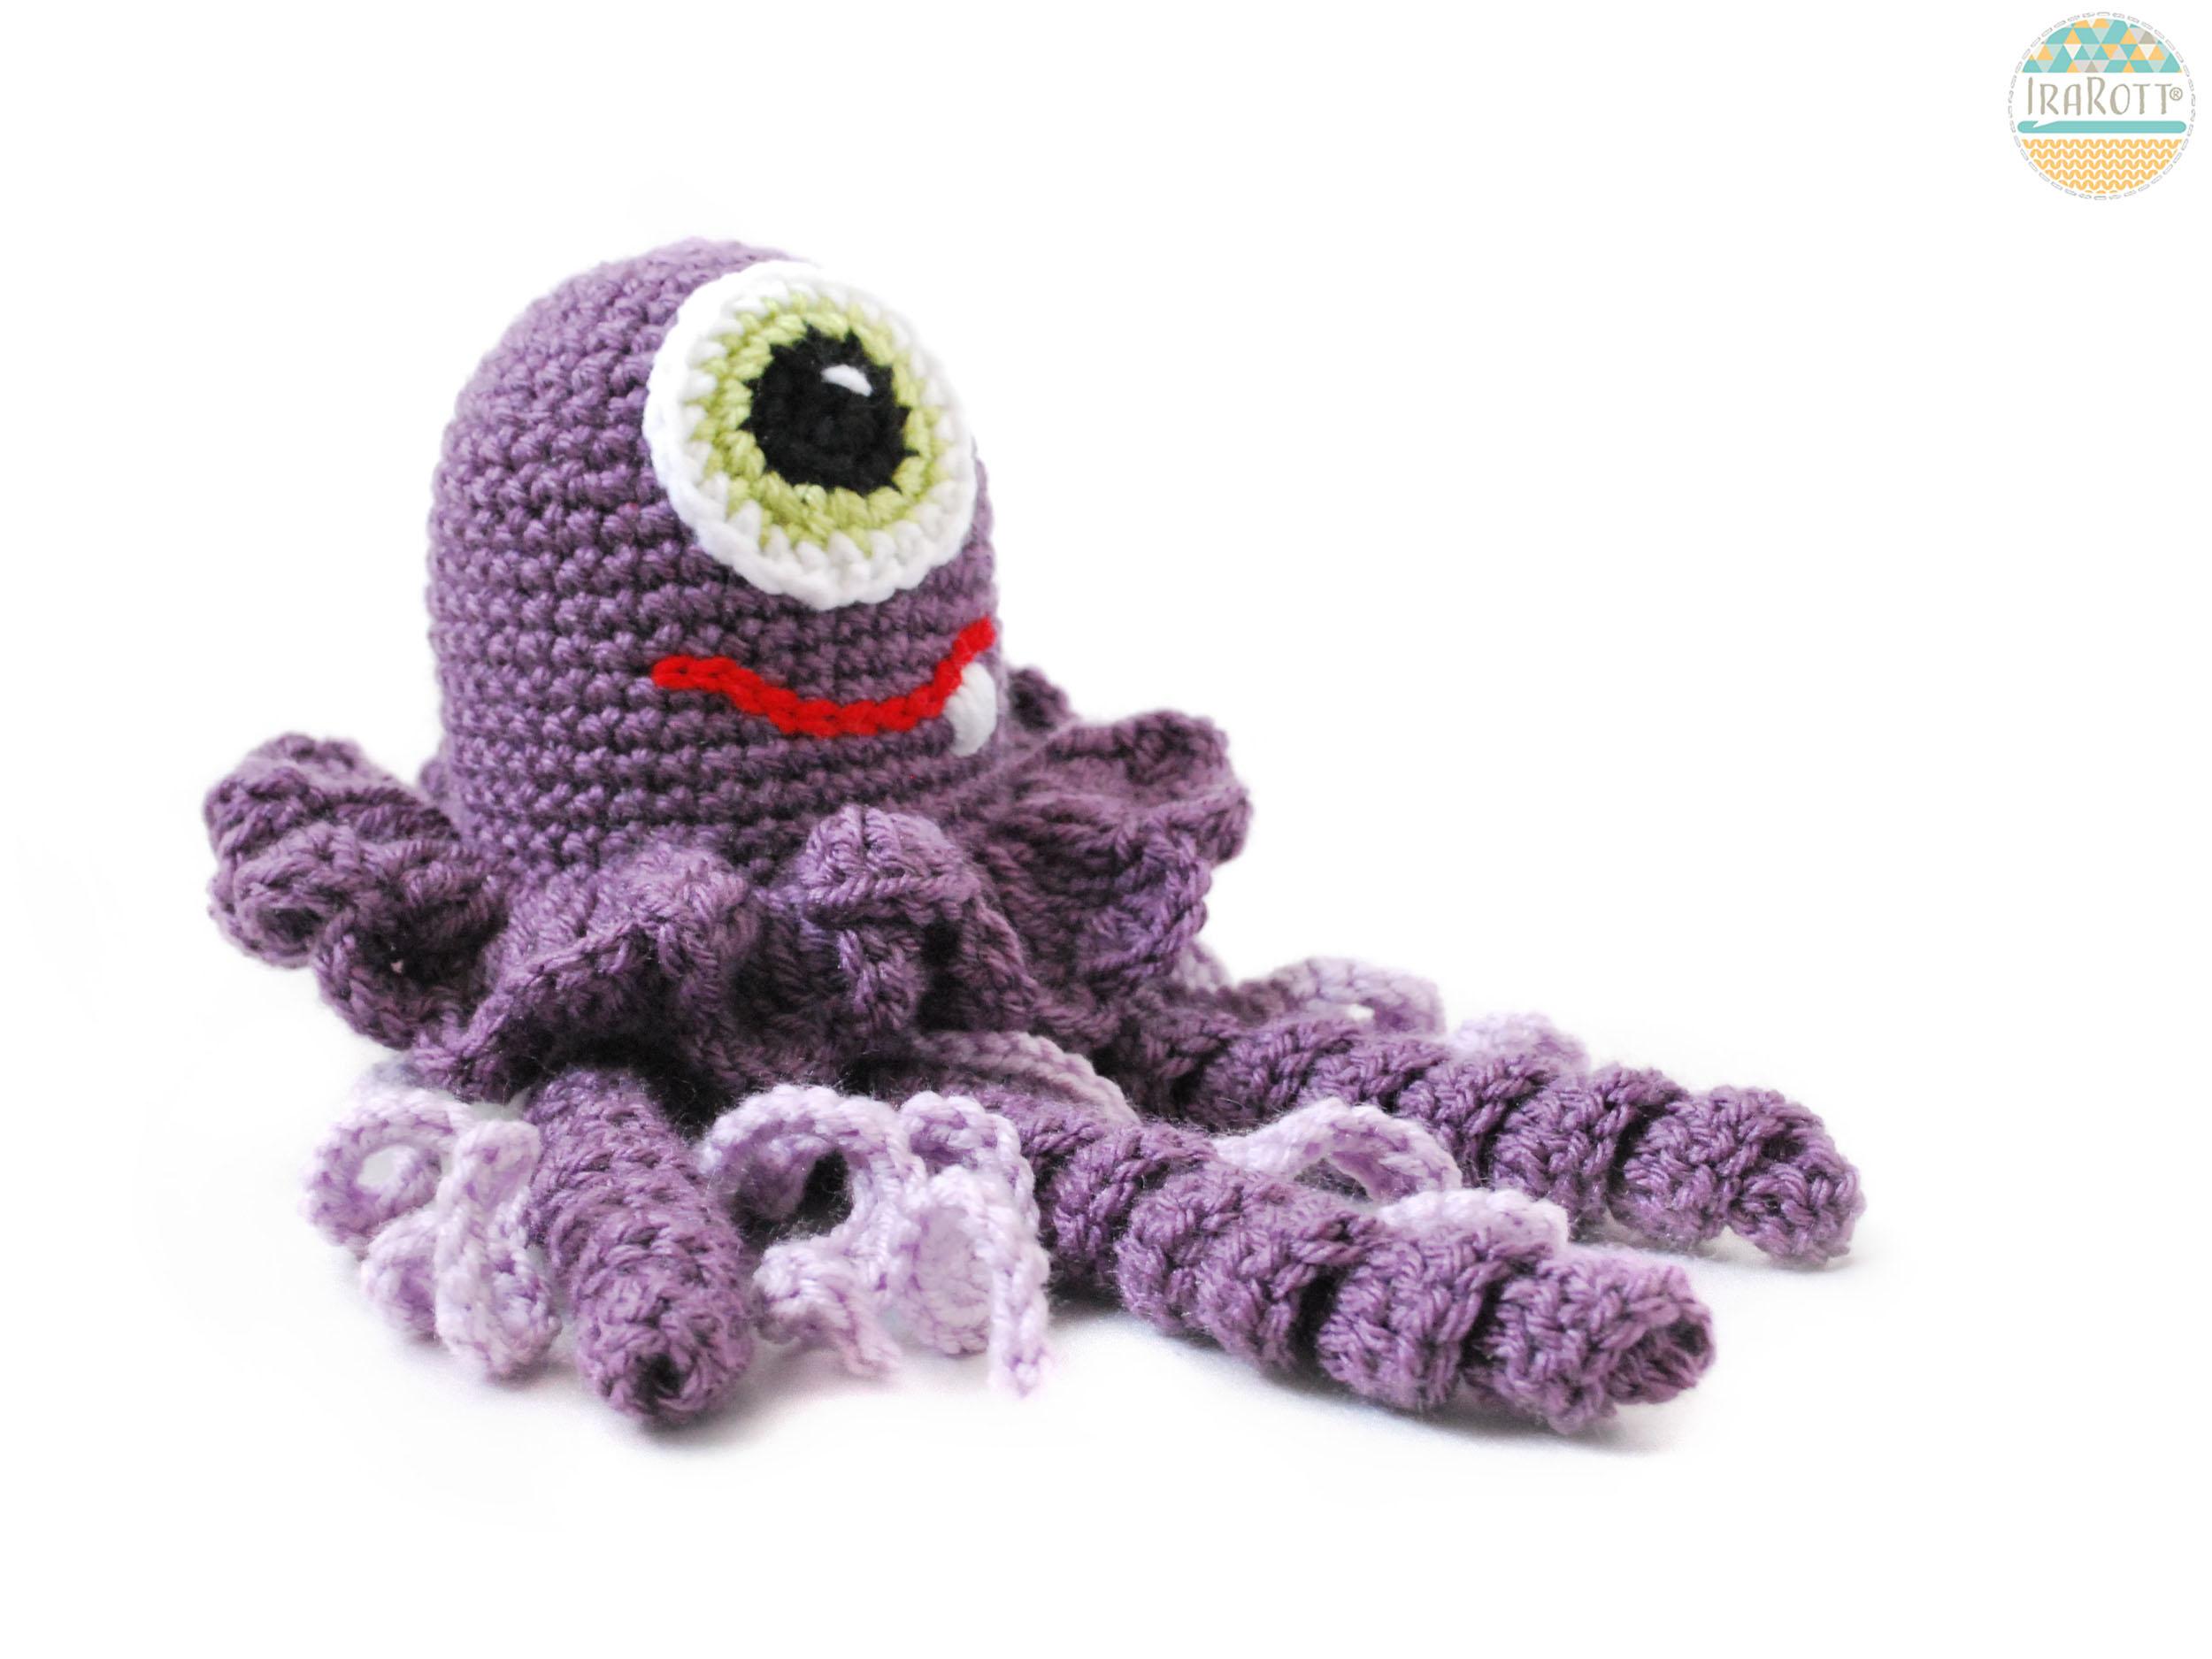 Peanut Butter The Jellyfish Monster Amigurumi Toy Pdf Crochet